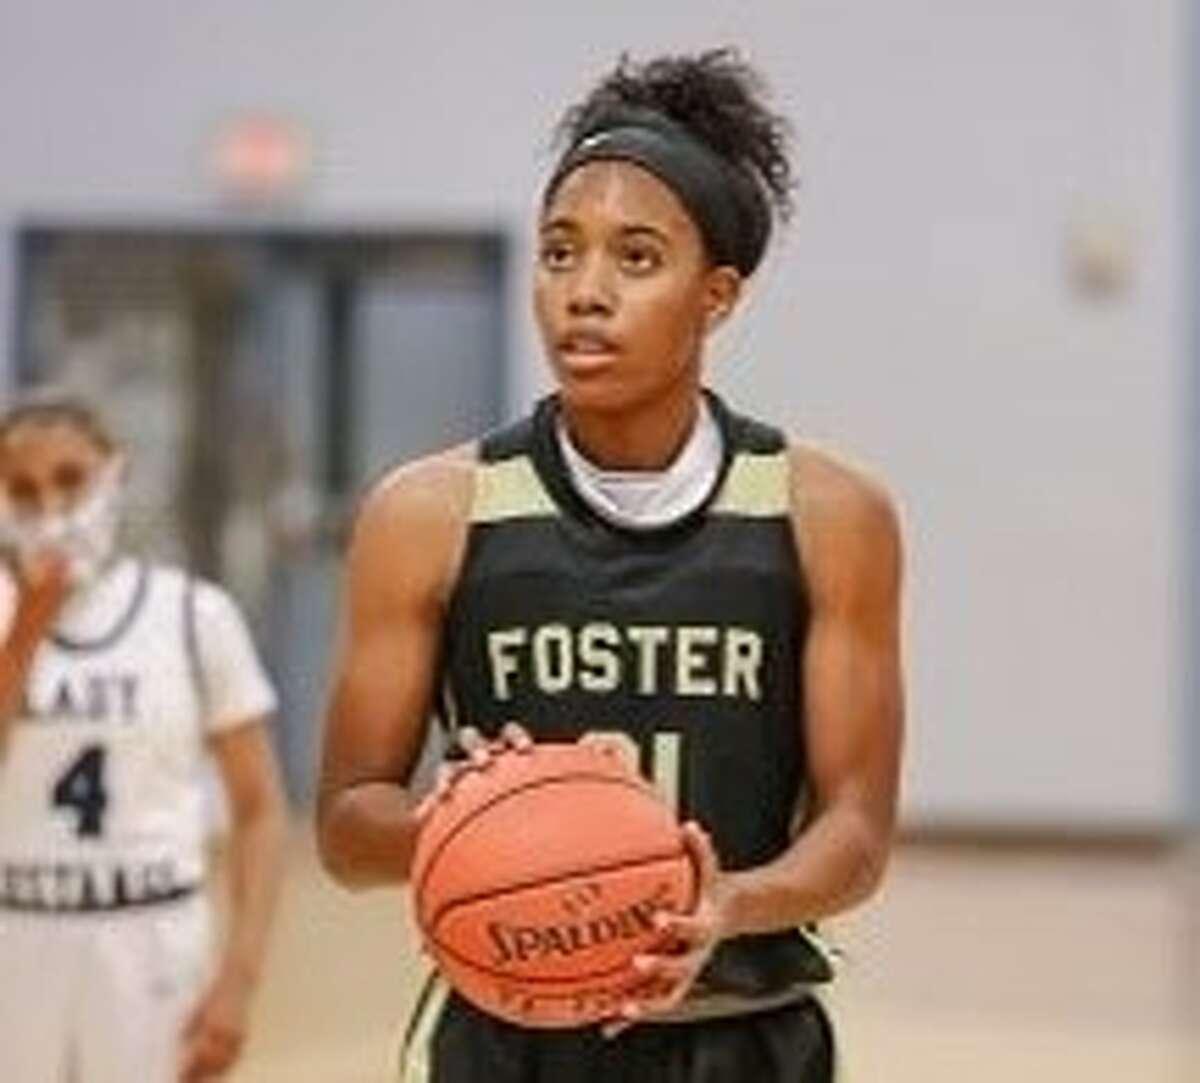 Foster High School basketball player Kaiya Wynn.